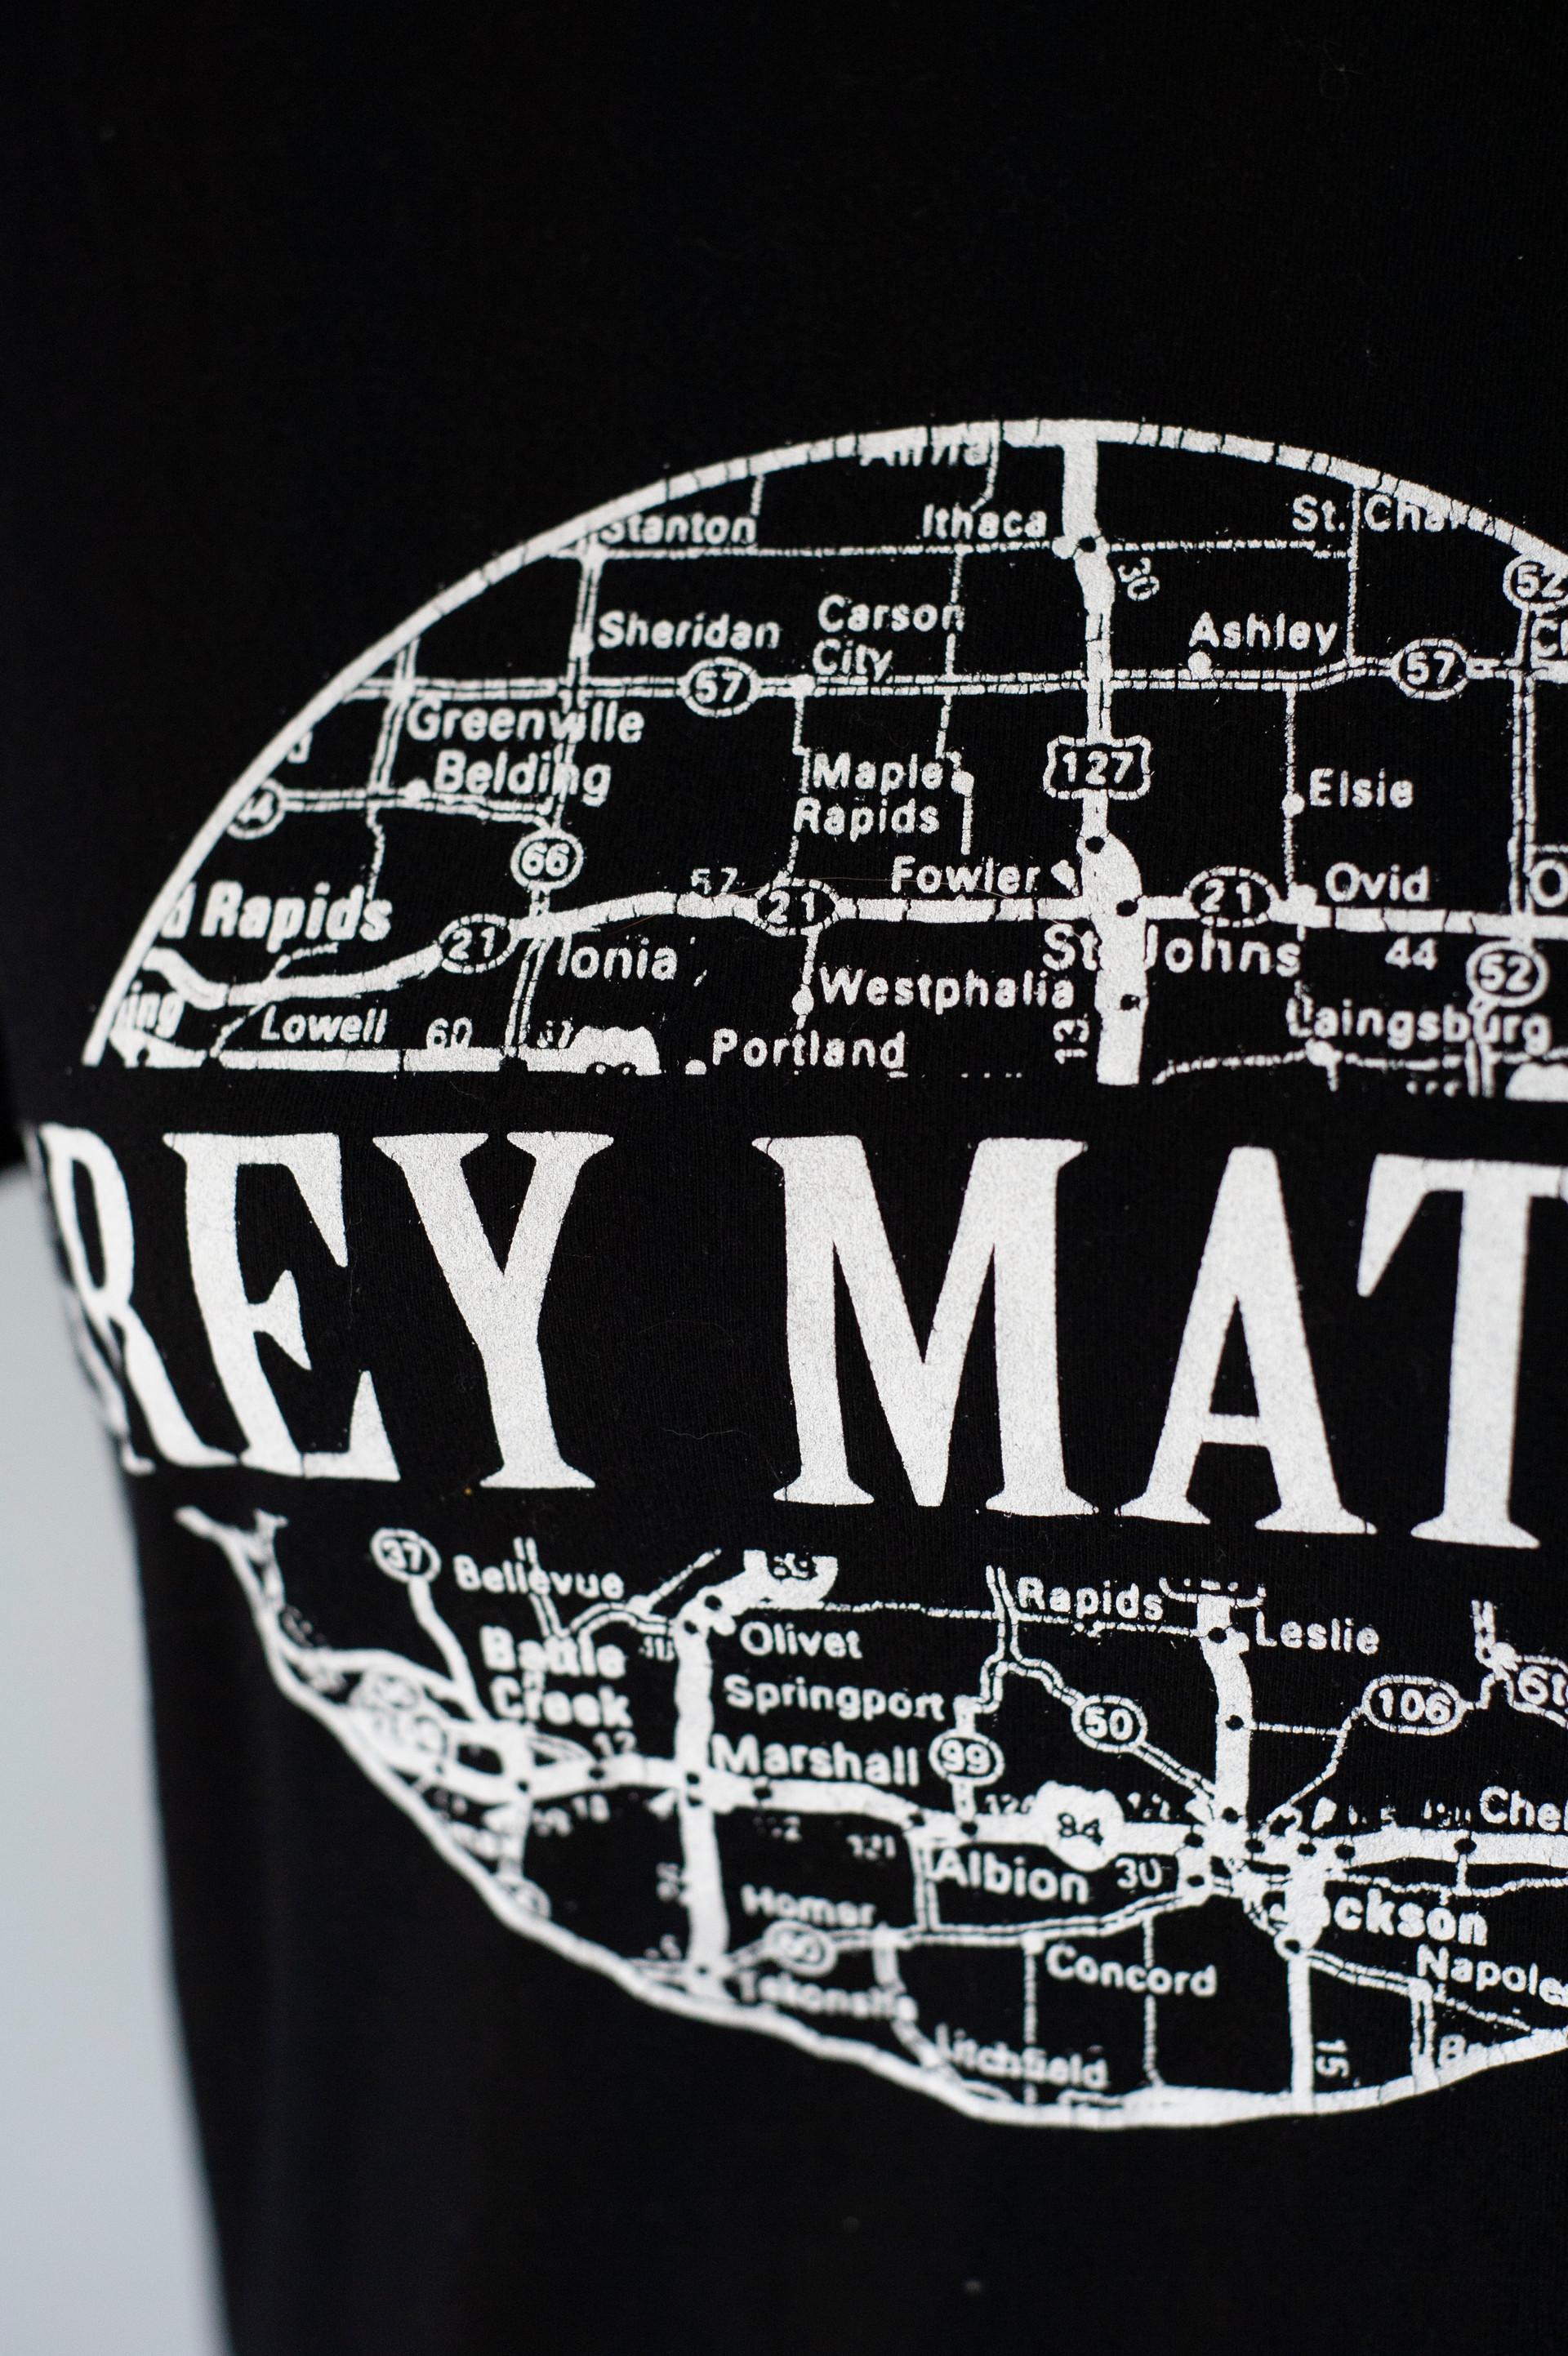 Grey Matter, Maps